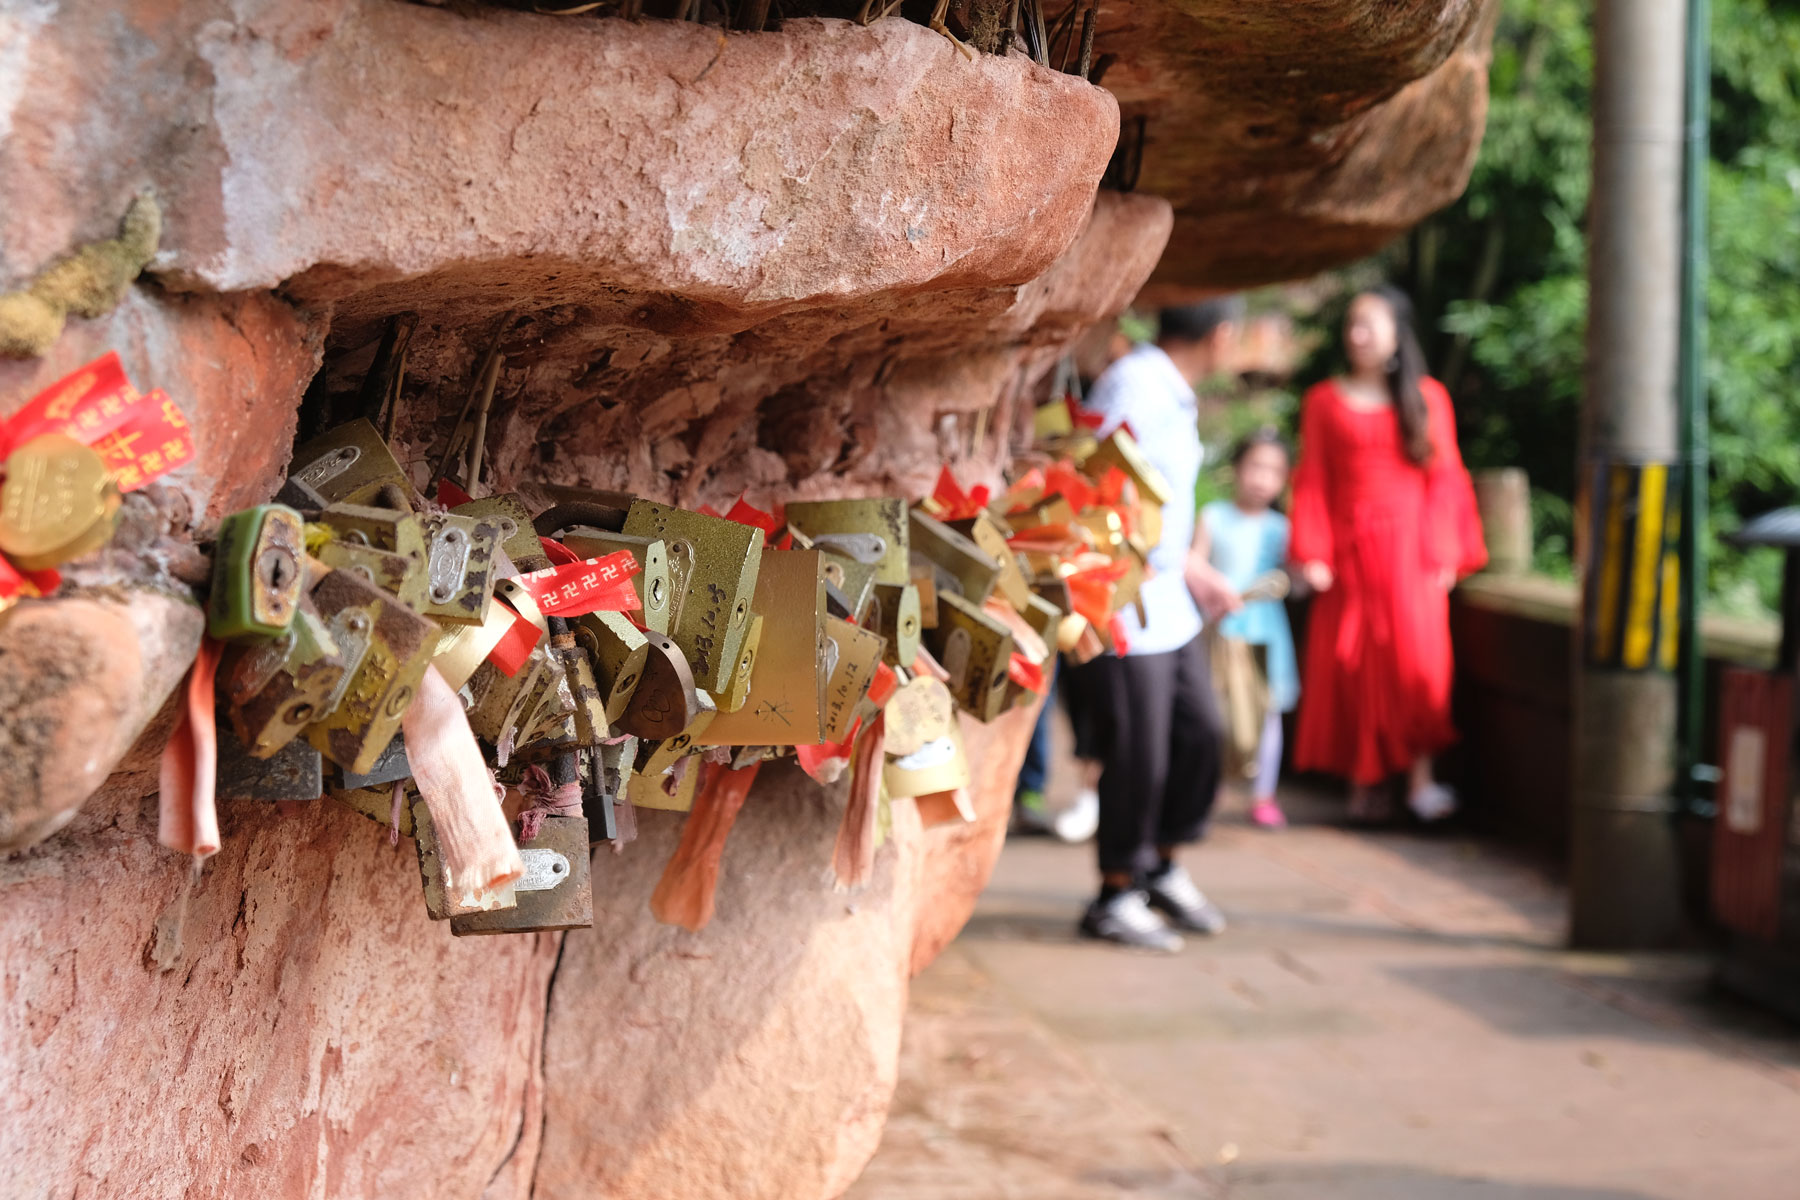 Vorhängeschlösser an einem Felsen im Shunan Zhuhai Nationalpark.